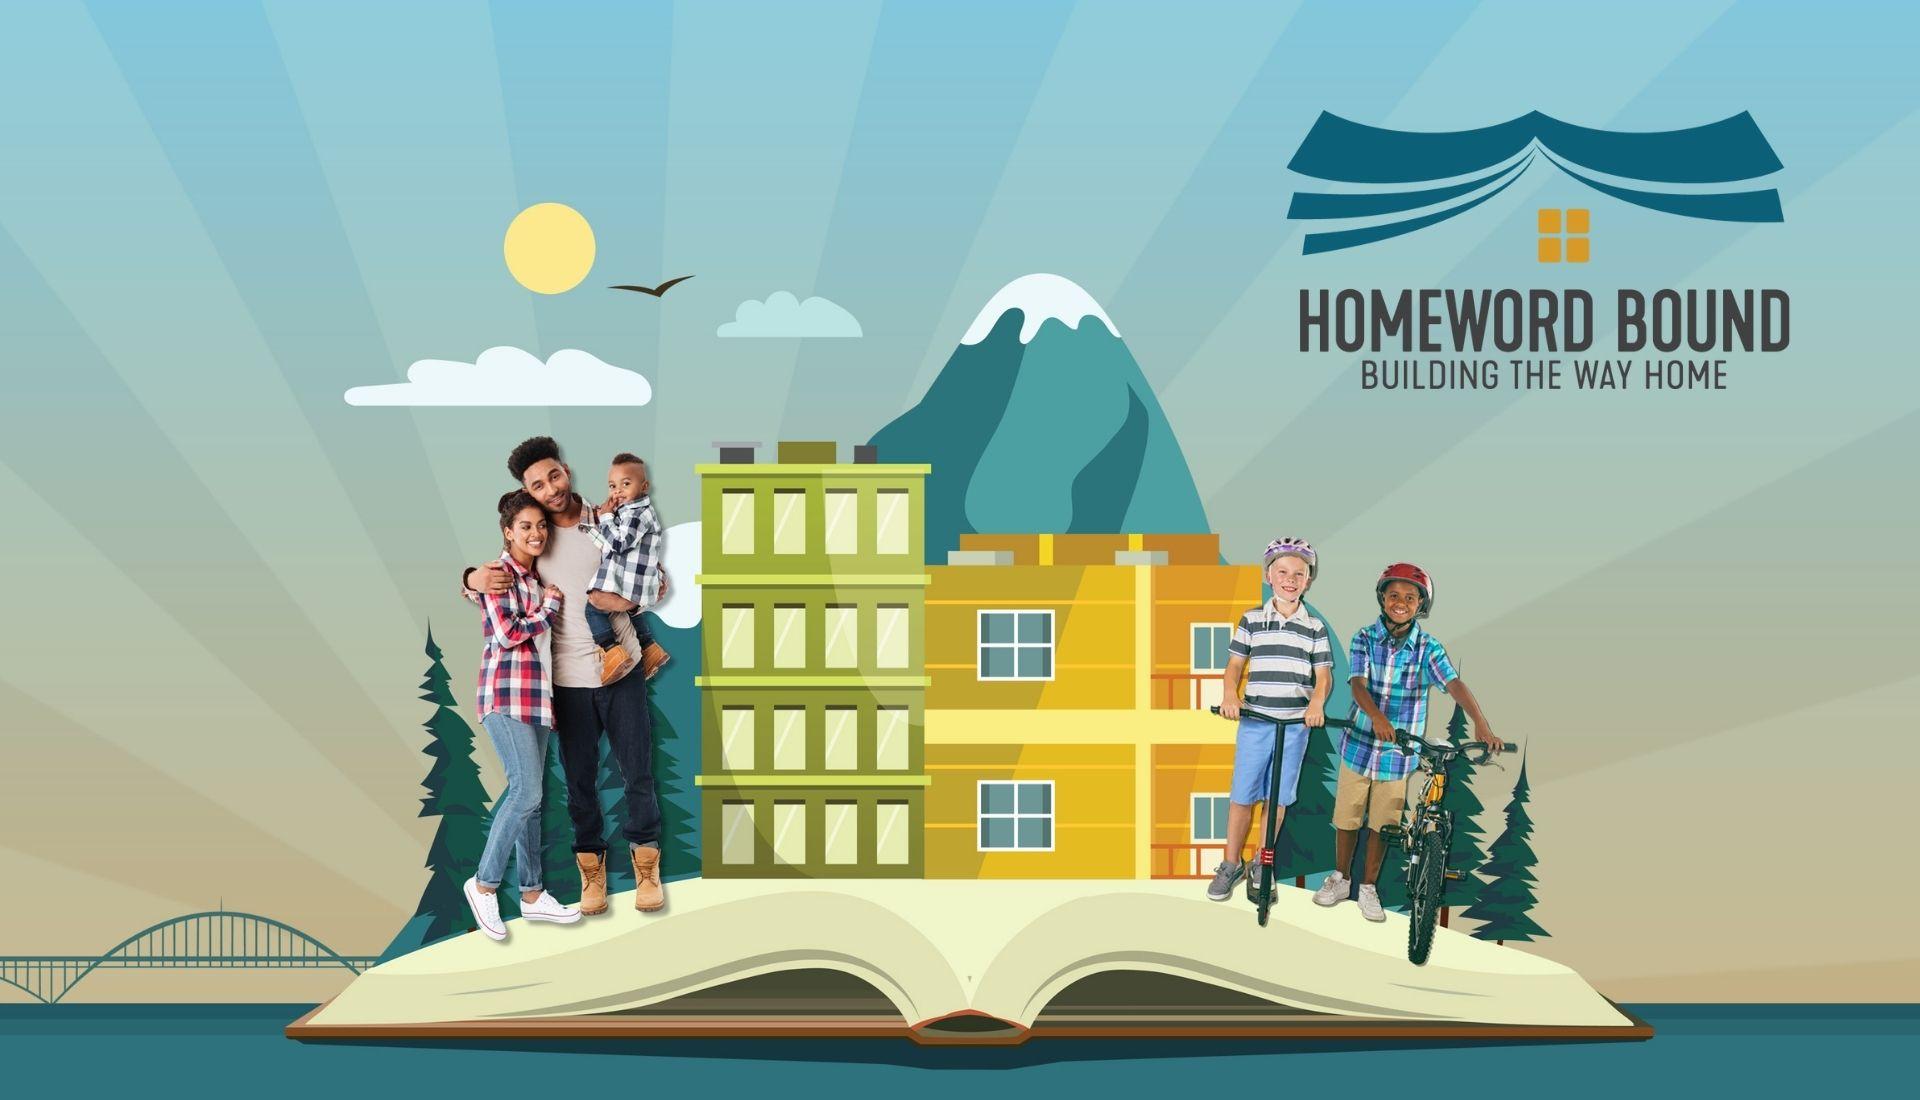 HomeWord Bound 2021